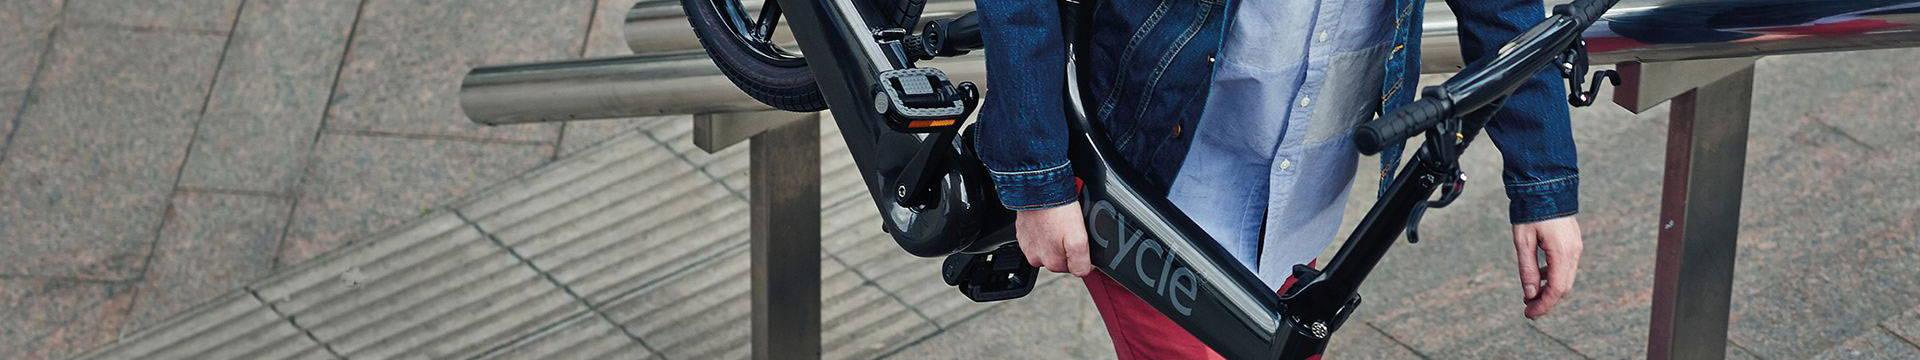 Portable Gocycle  electric folding bikes.